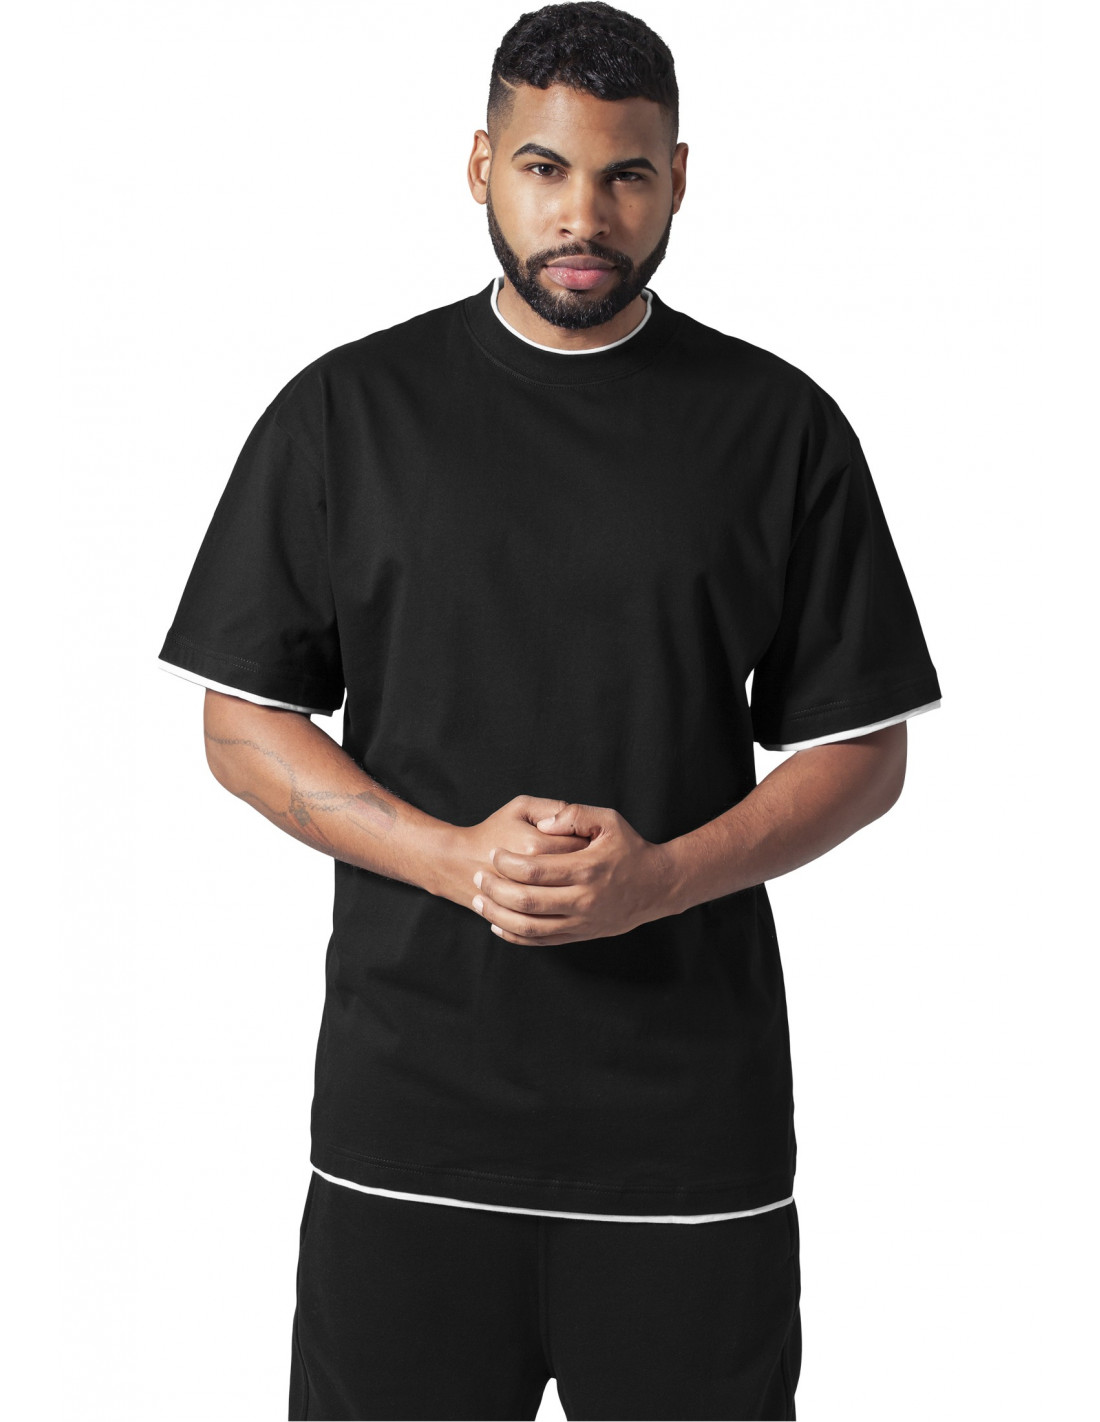 Urban 2-tone t-shirt black / white